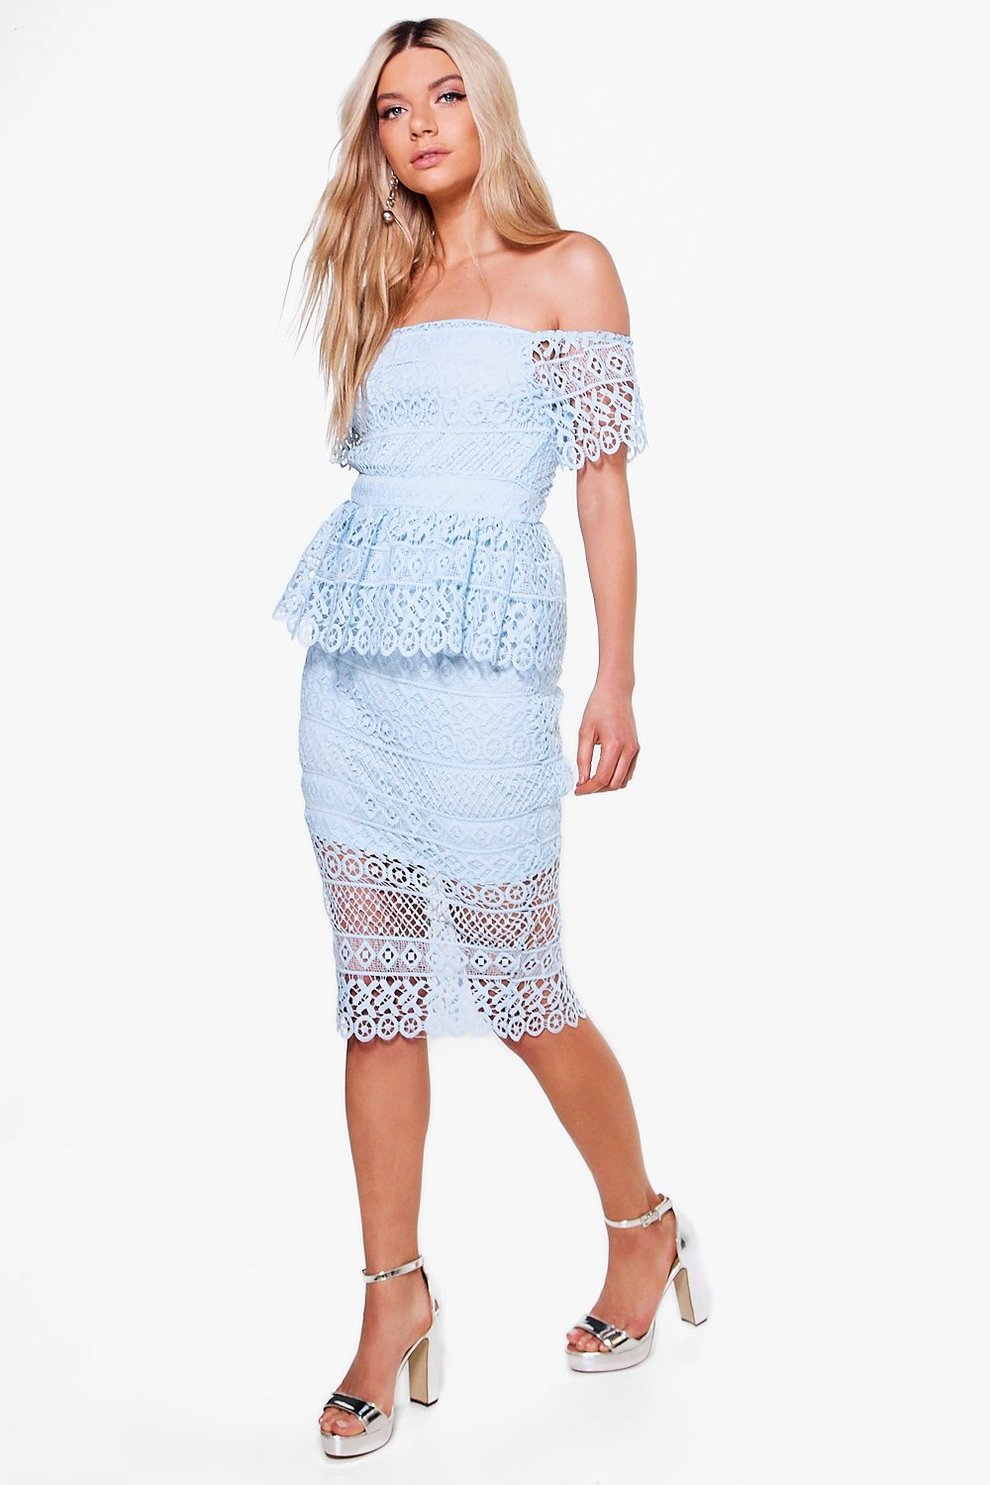 4b3131c52a79 Boutique Lace Peplum Midi Dress | Boohoo